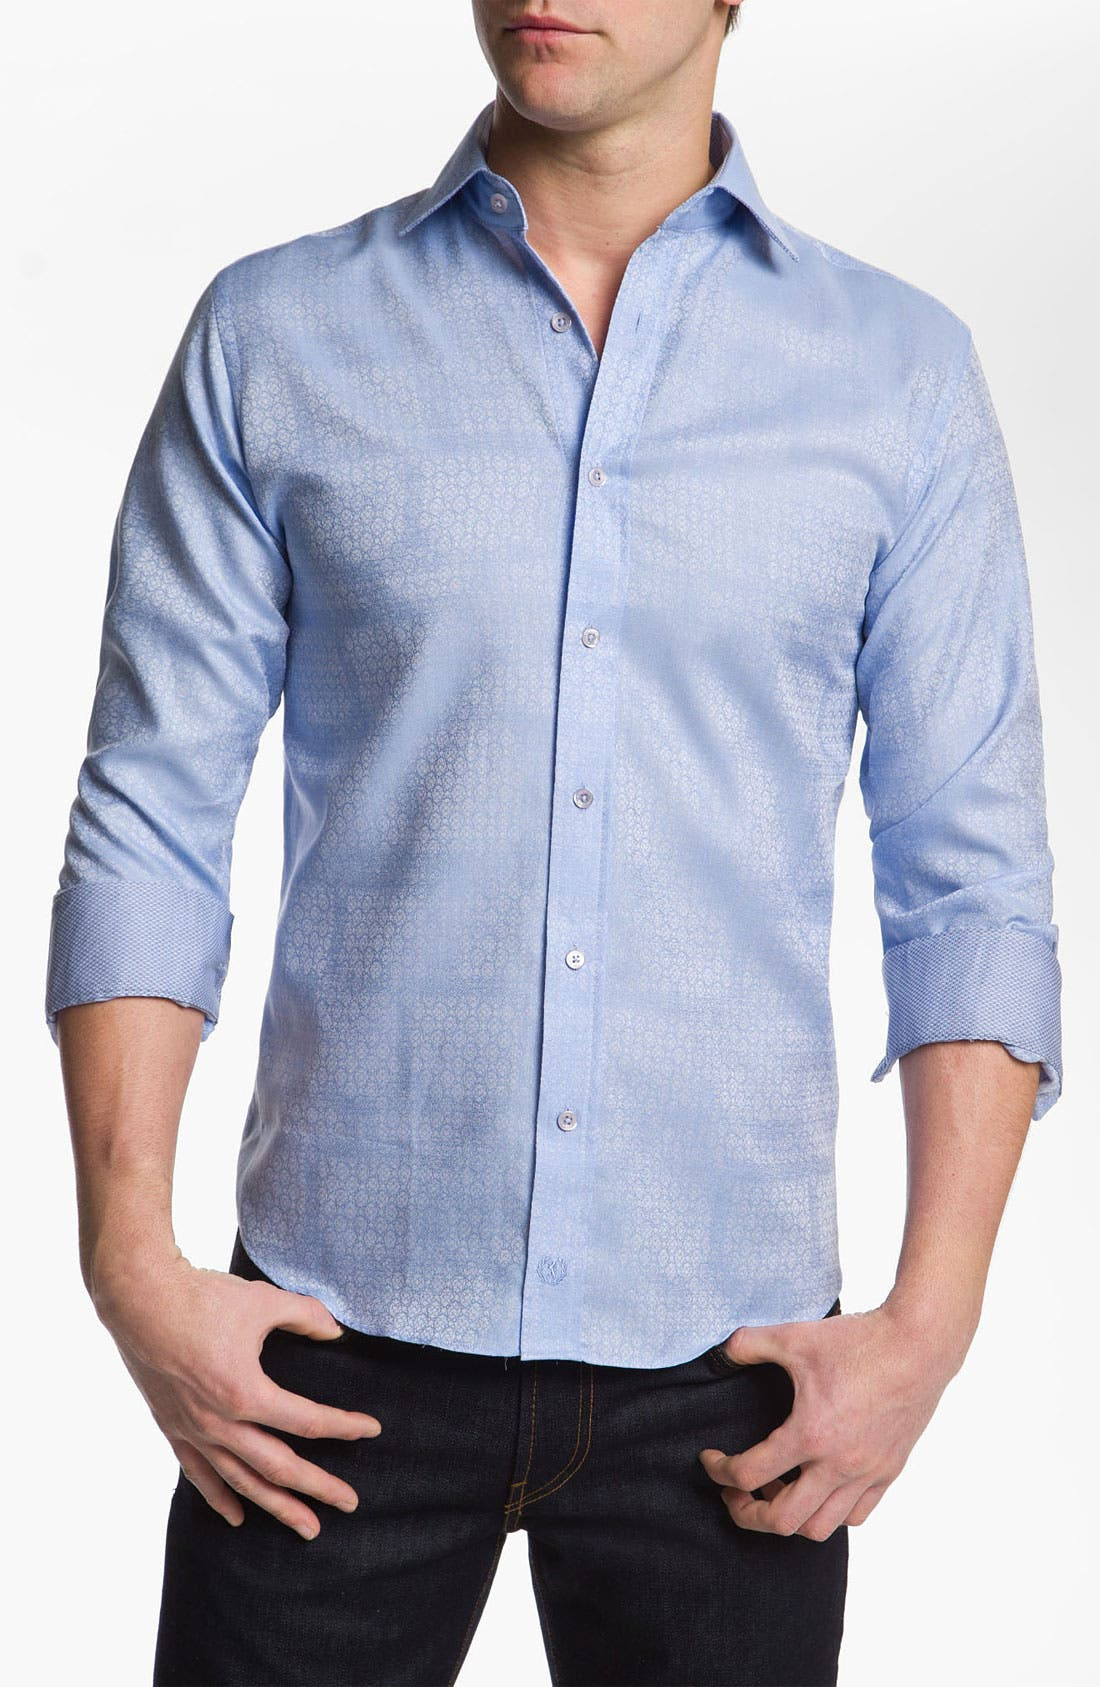 Alternate Image 1 Selected - Bugatchi Uomo Classic Fit Sport Shirt